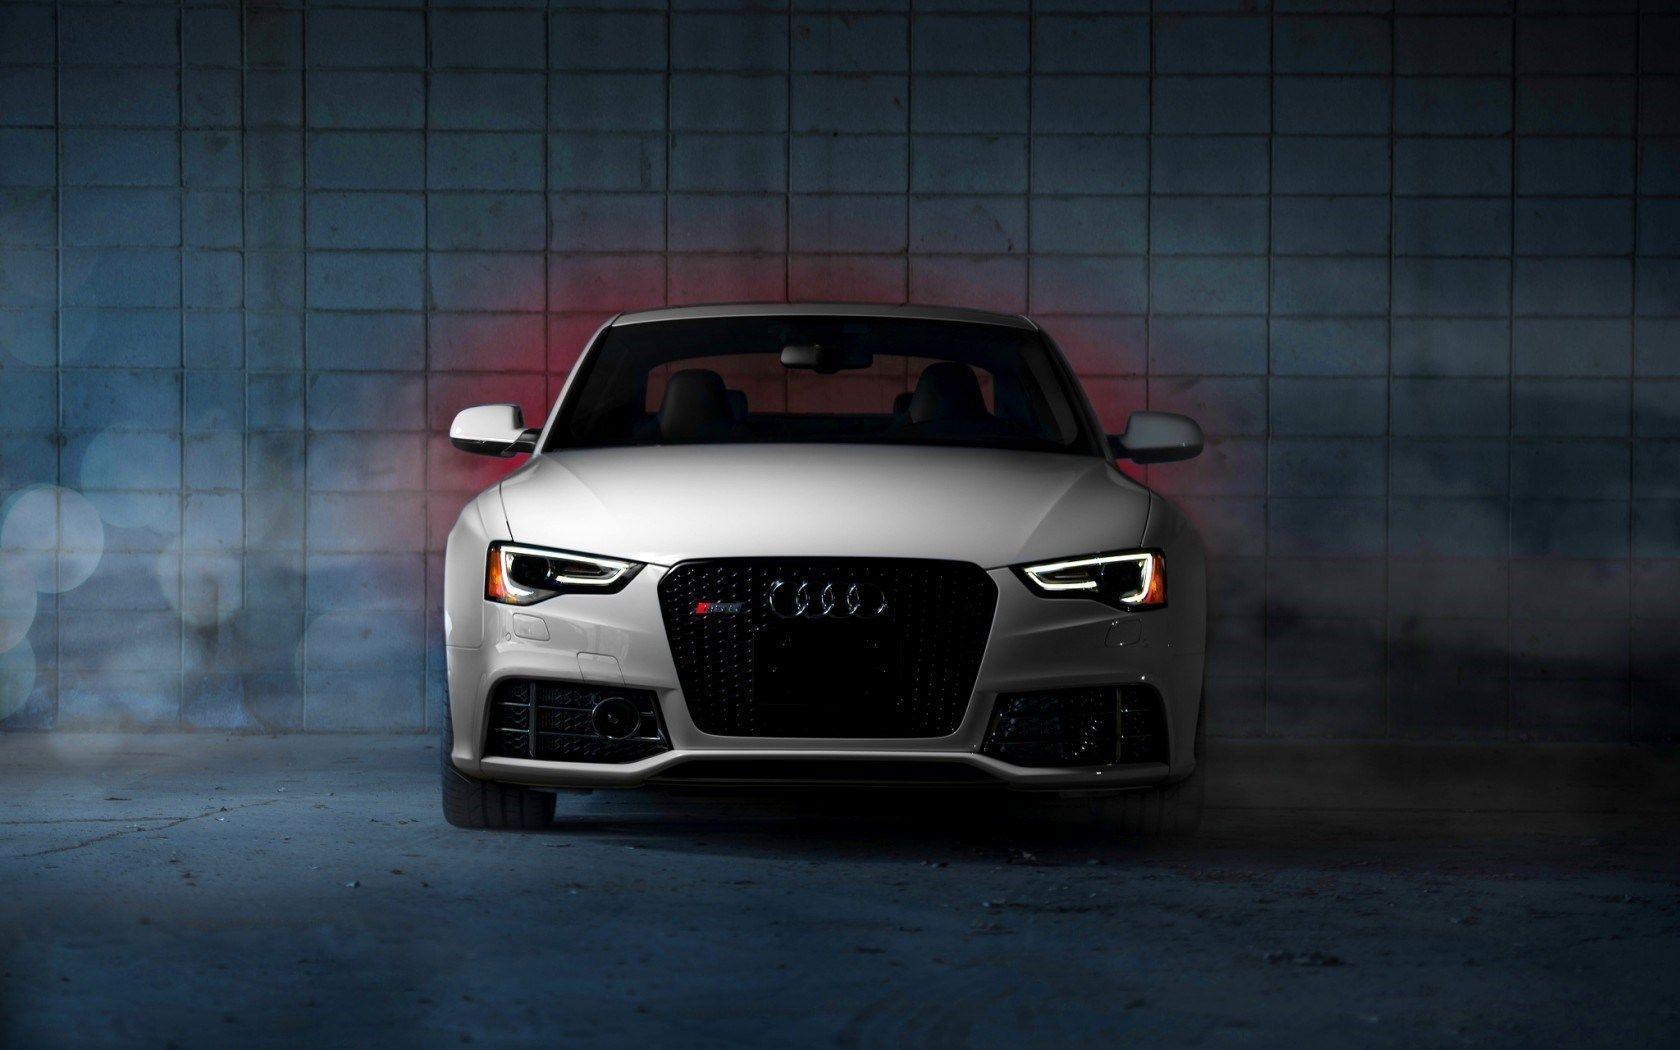 Audi Rs5 Sportback 4k 2019 Wallpapers: Audi RS5 Wallpapers